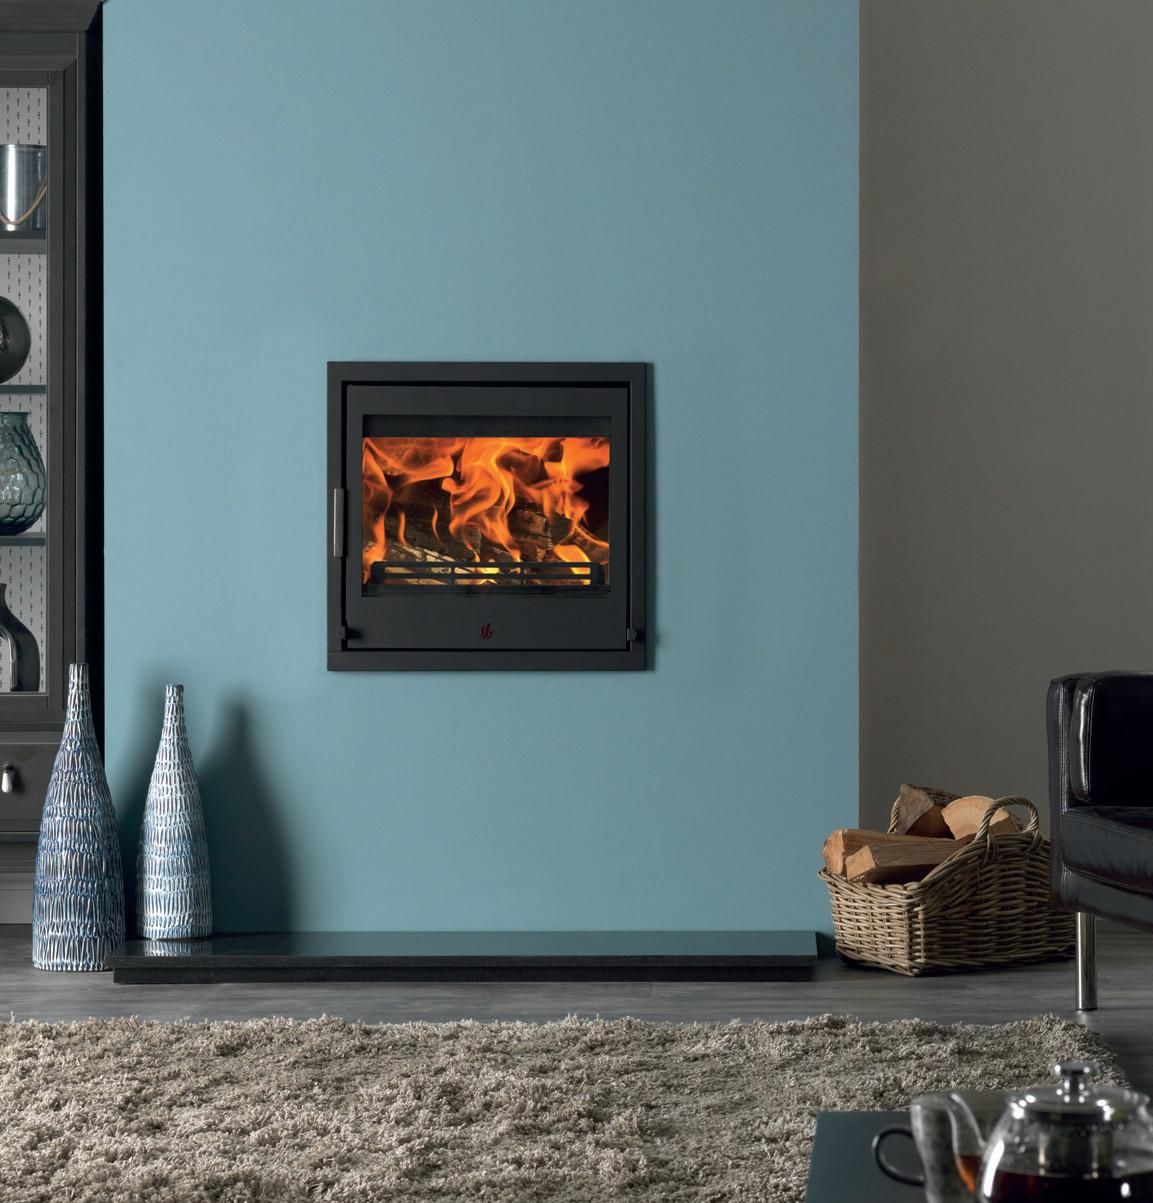 Acr Tenbury T550 Flames Amp Fireplaces Banbridge